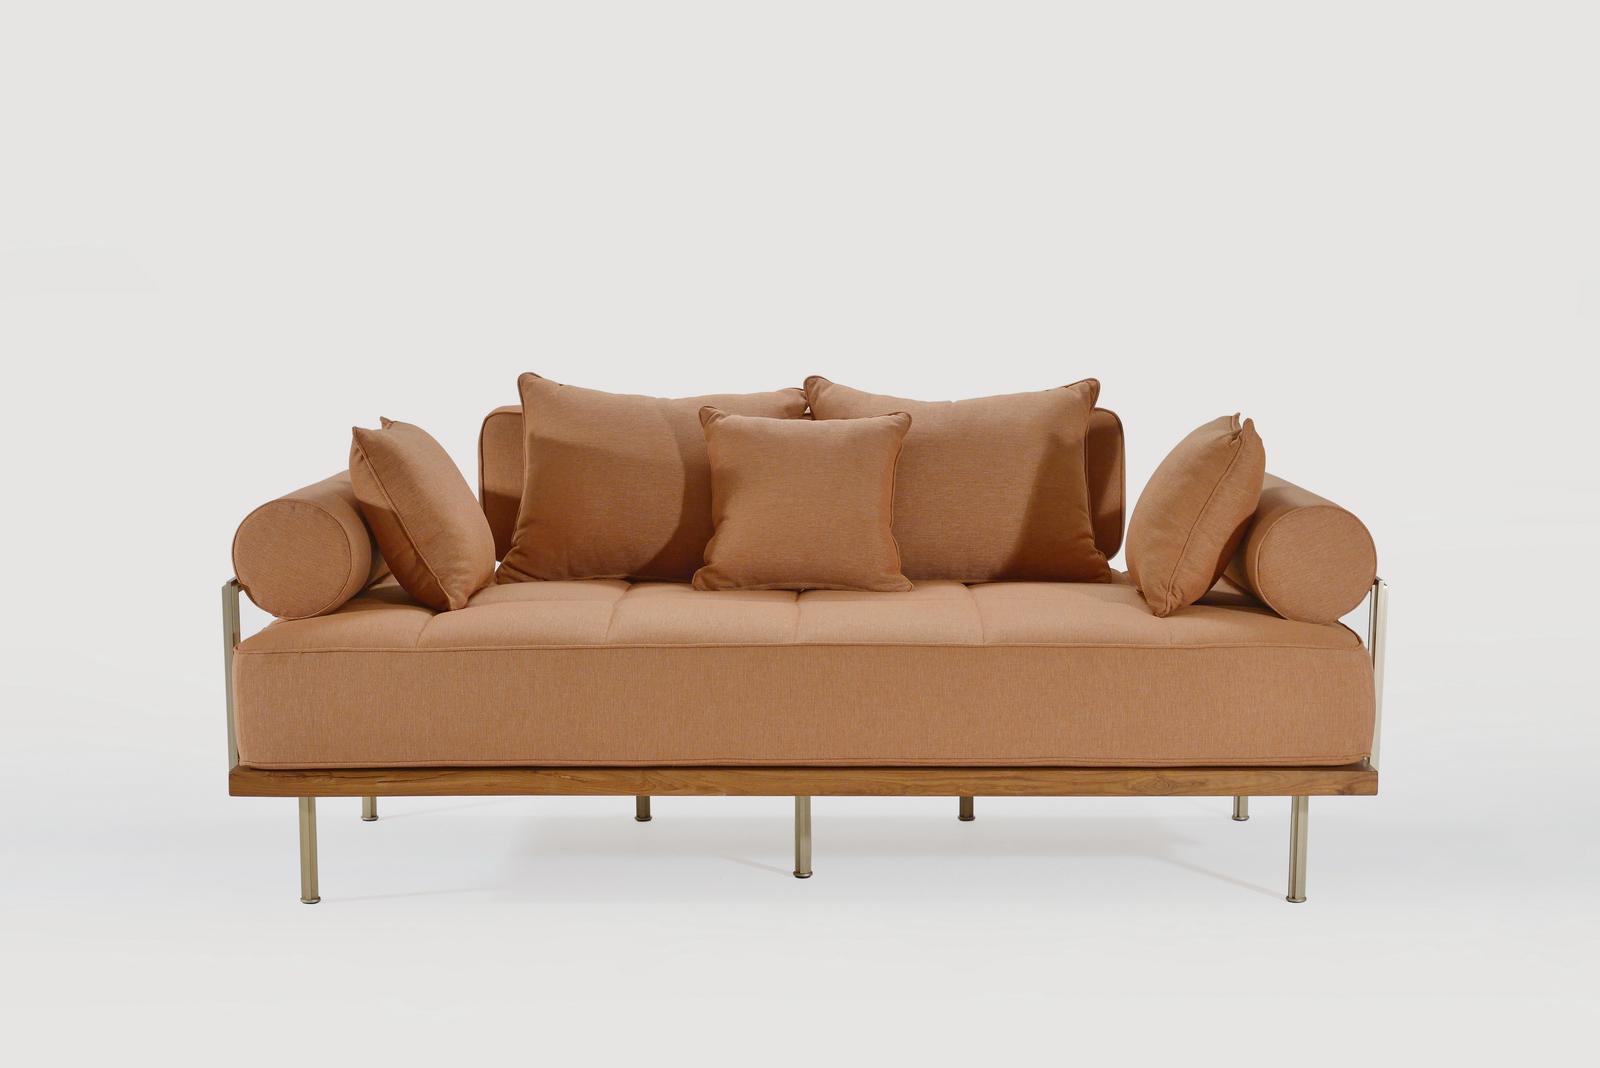 PTendercool-Ourdoor-Sofa-PT71(x2)-BS1-TE-DO-Palm Plain (Henna)-191101-01